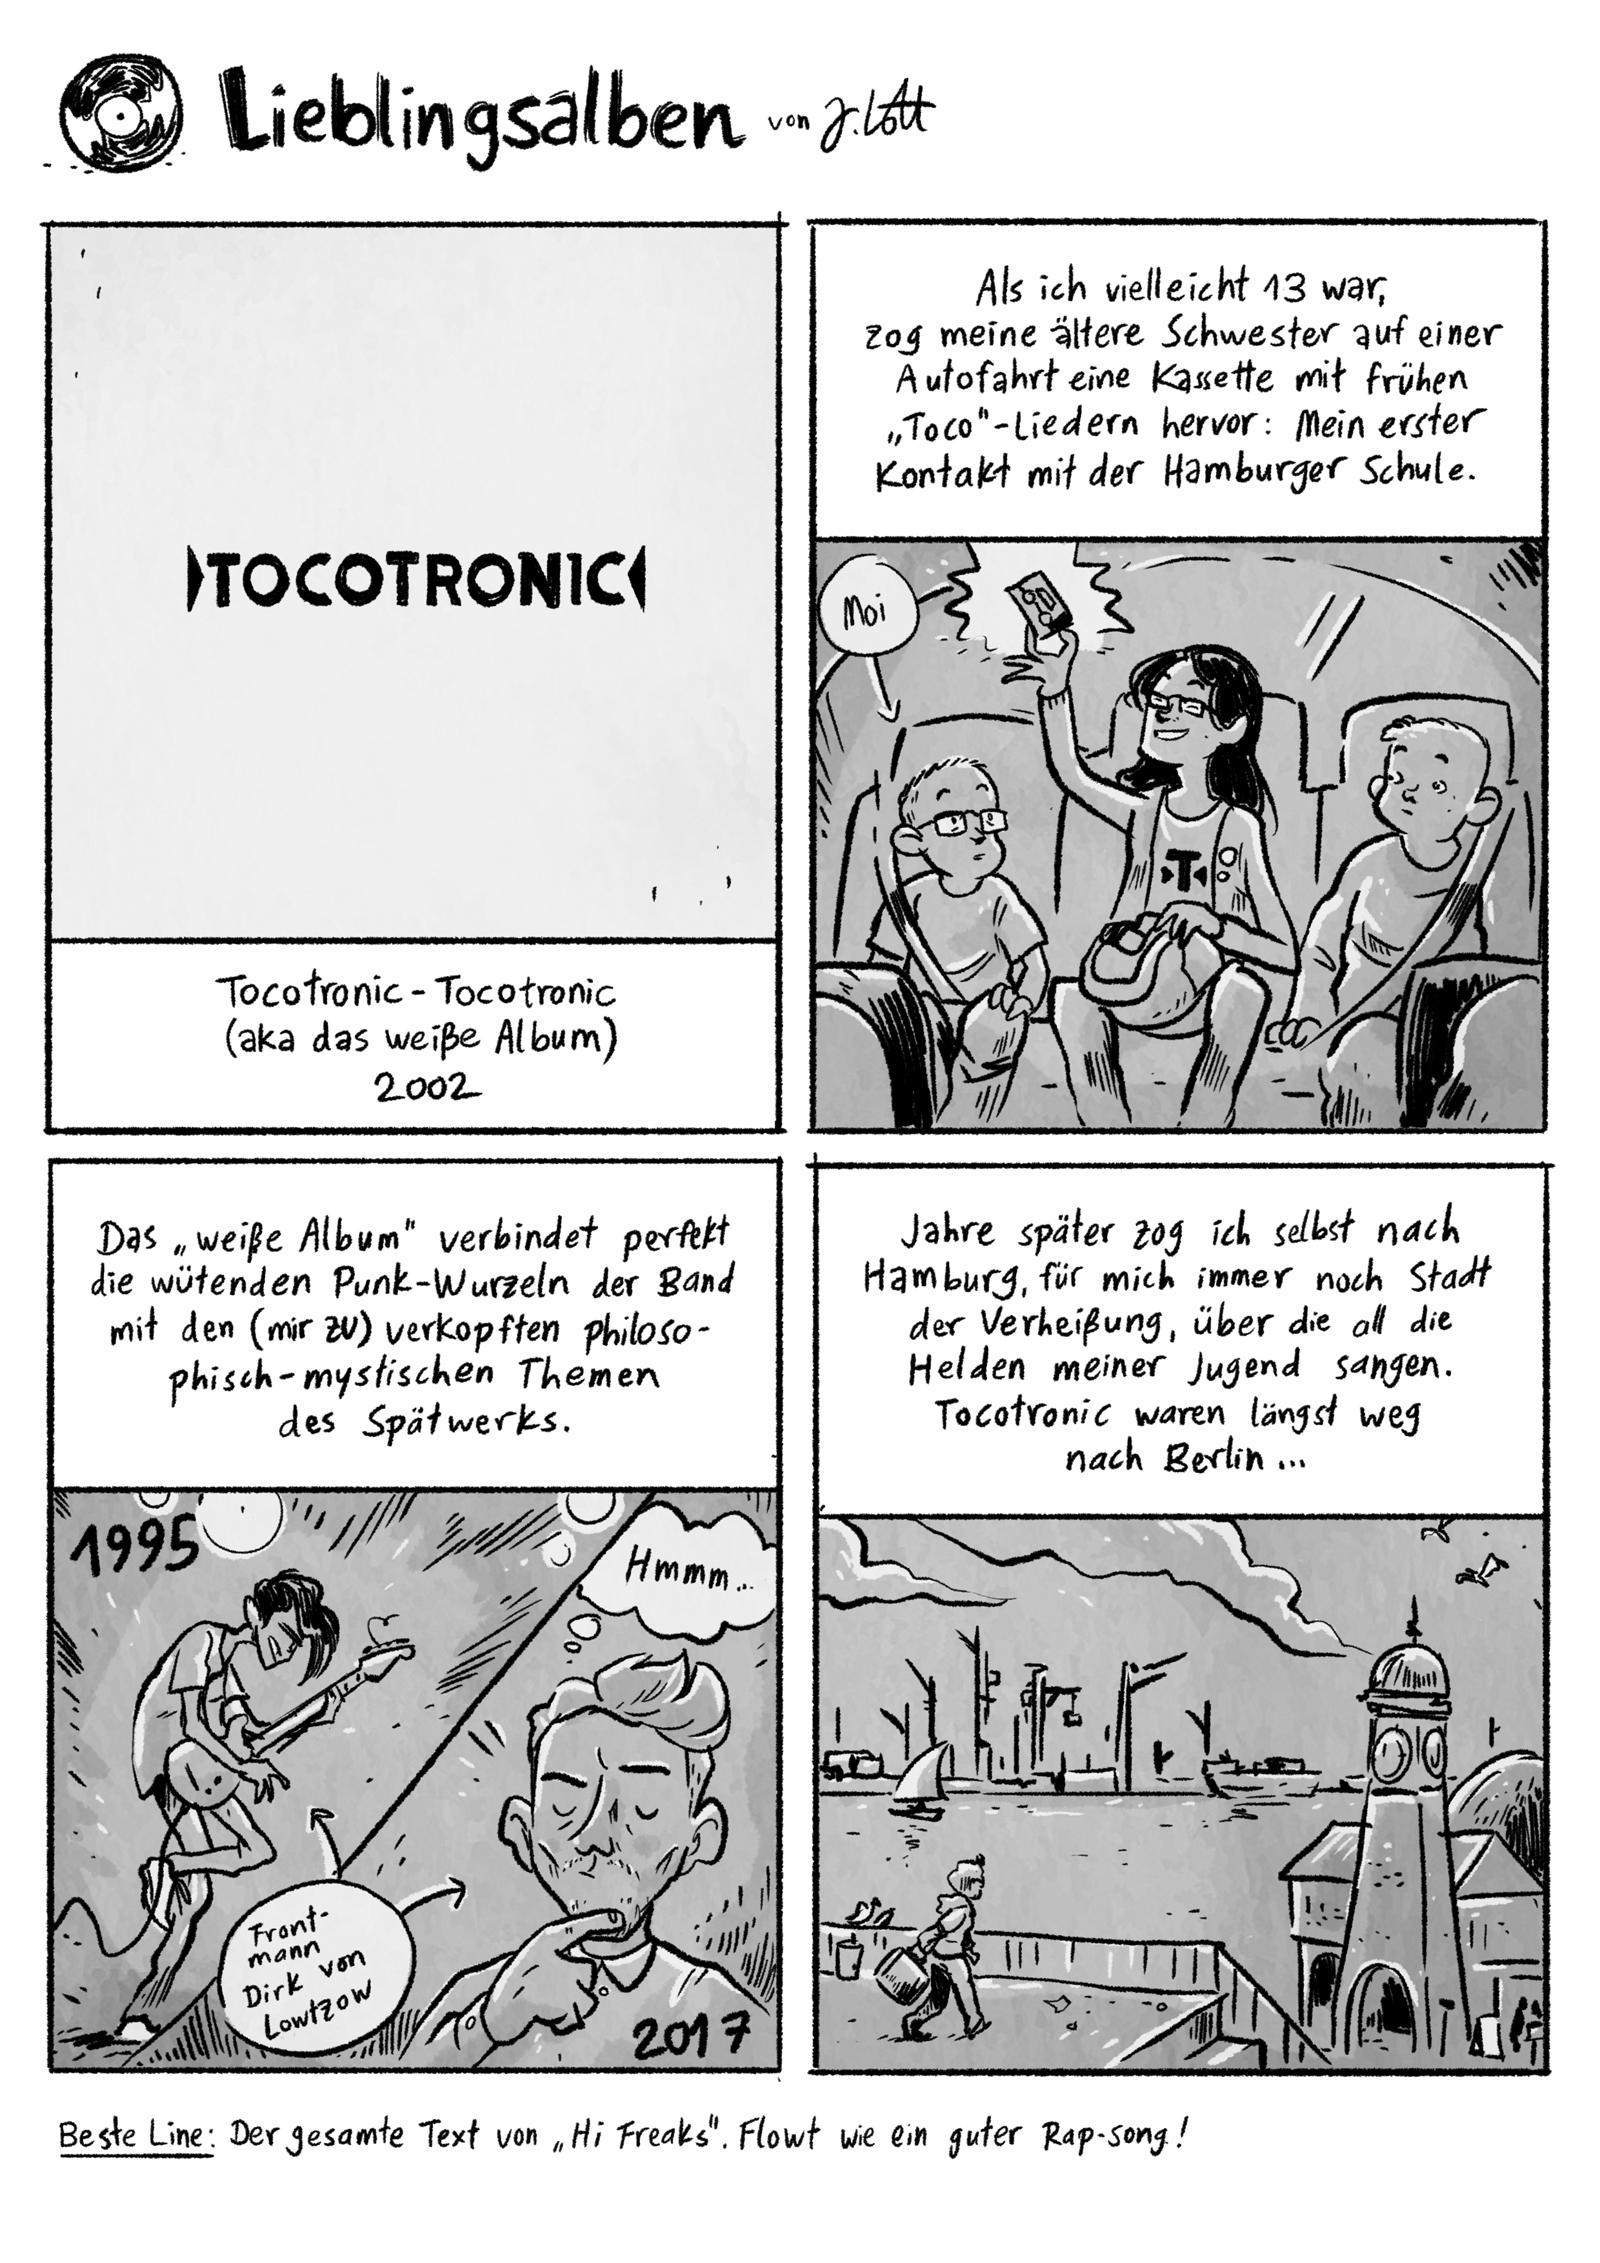 Lieblingsalben: Tocotronic